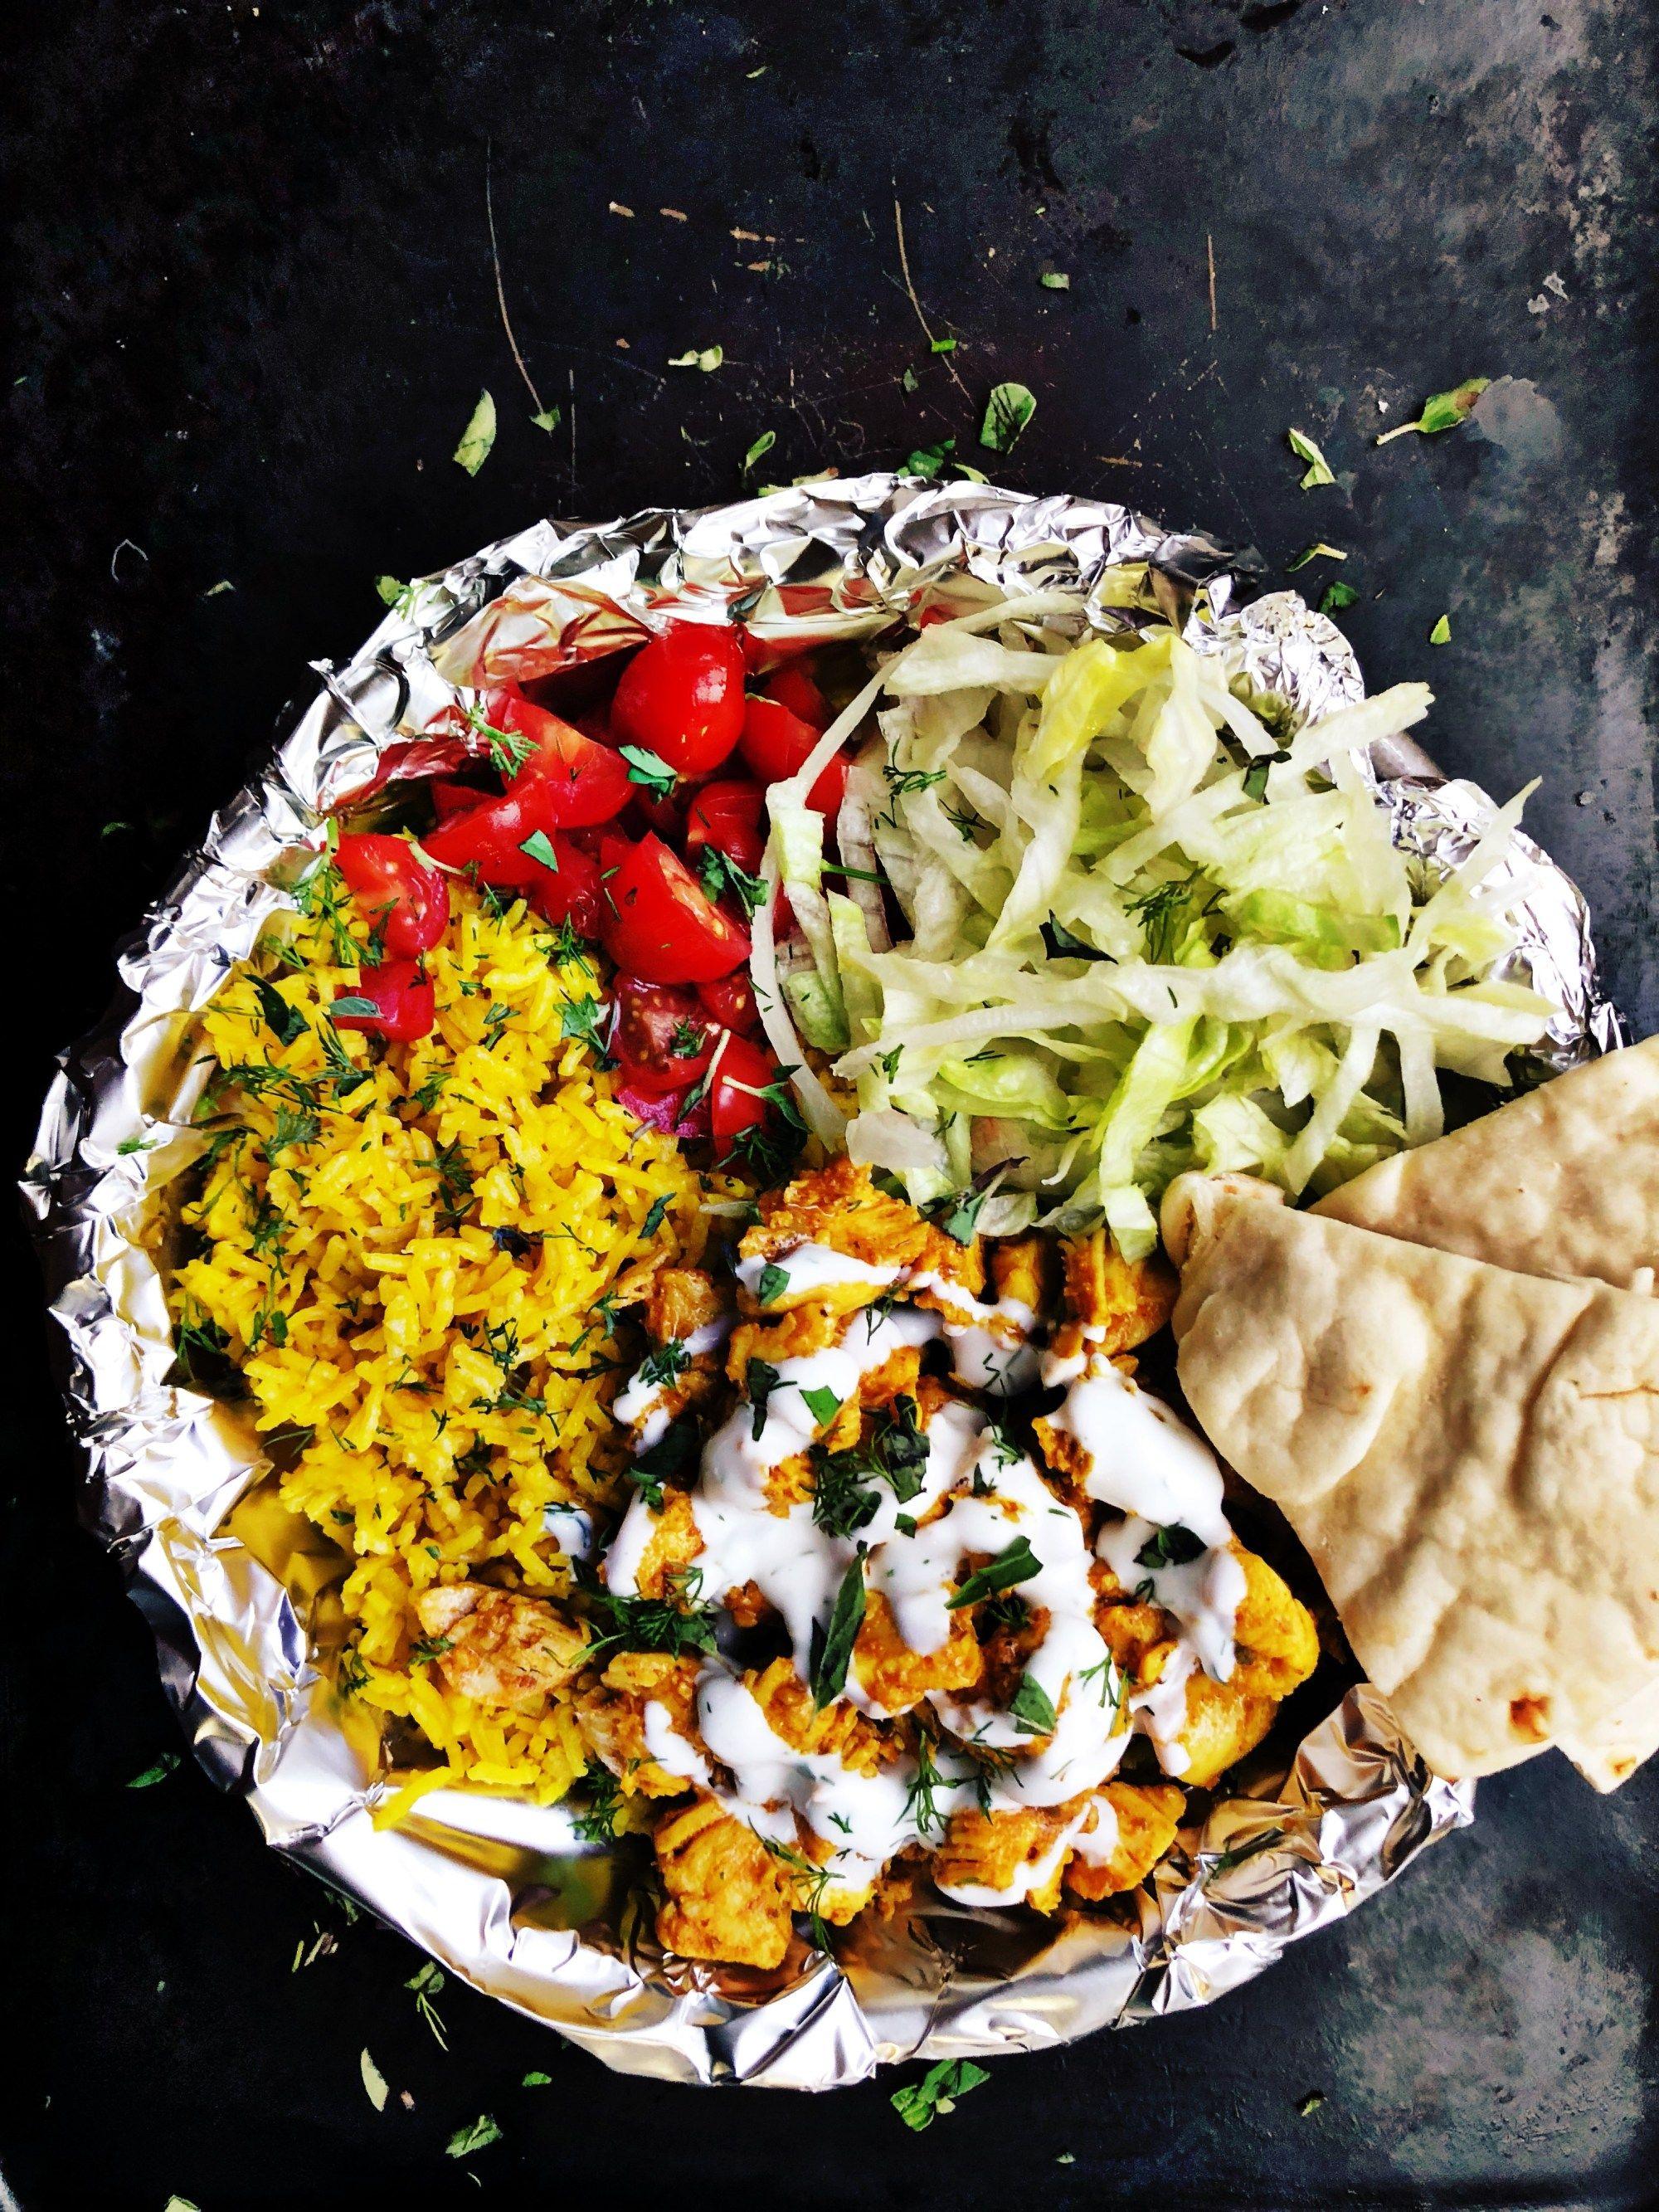 Halal style street food plum street collective recipe